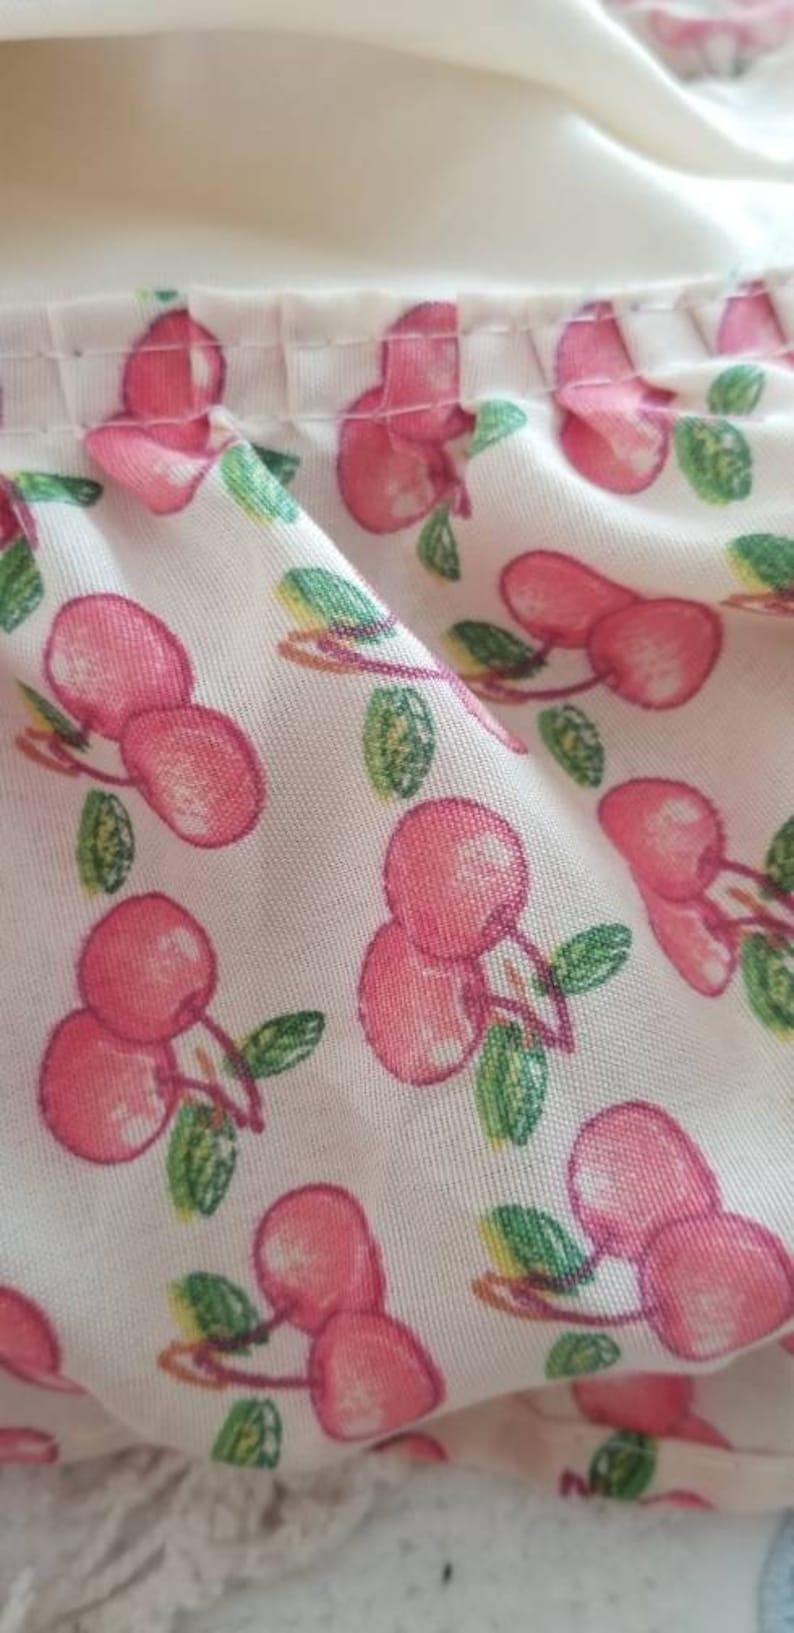 Adorable cherries window treatment...valance plus panel...creamy color background